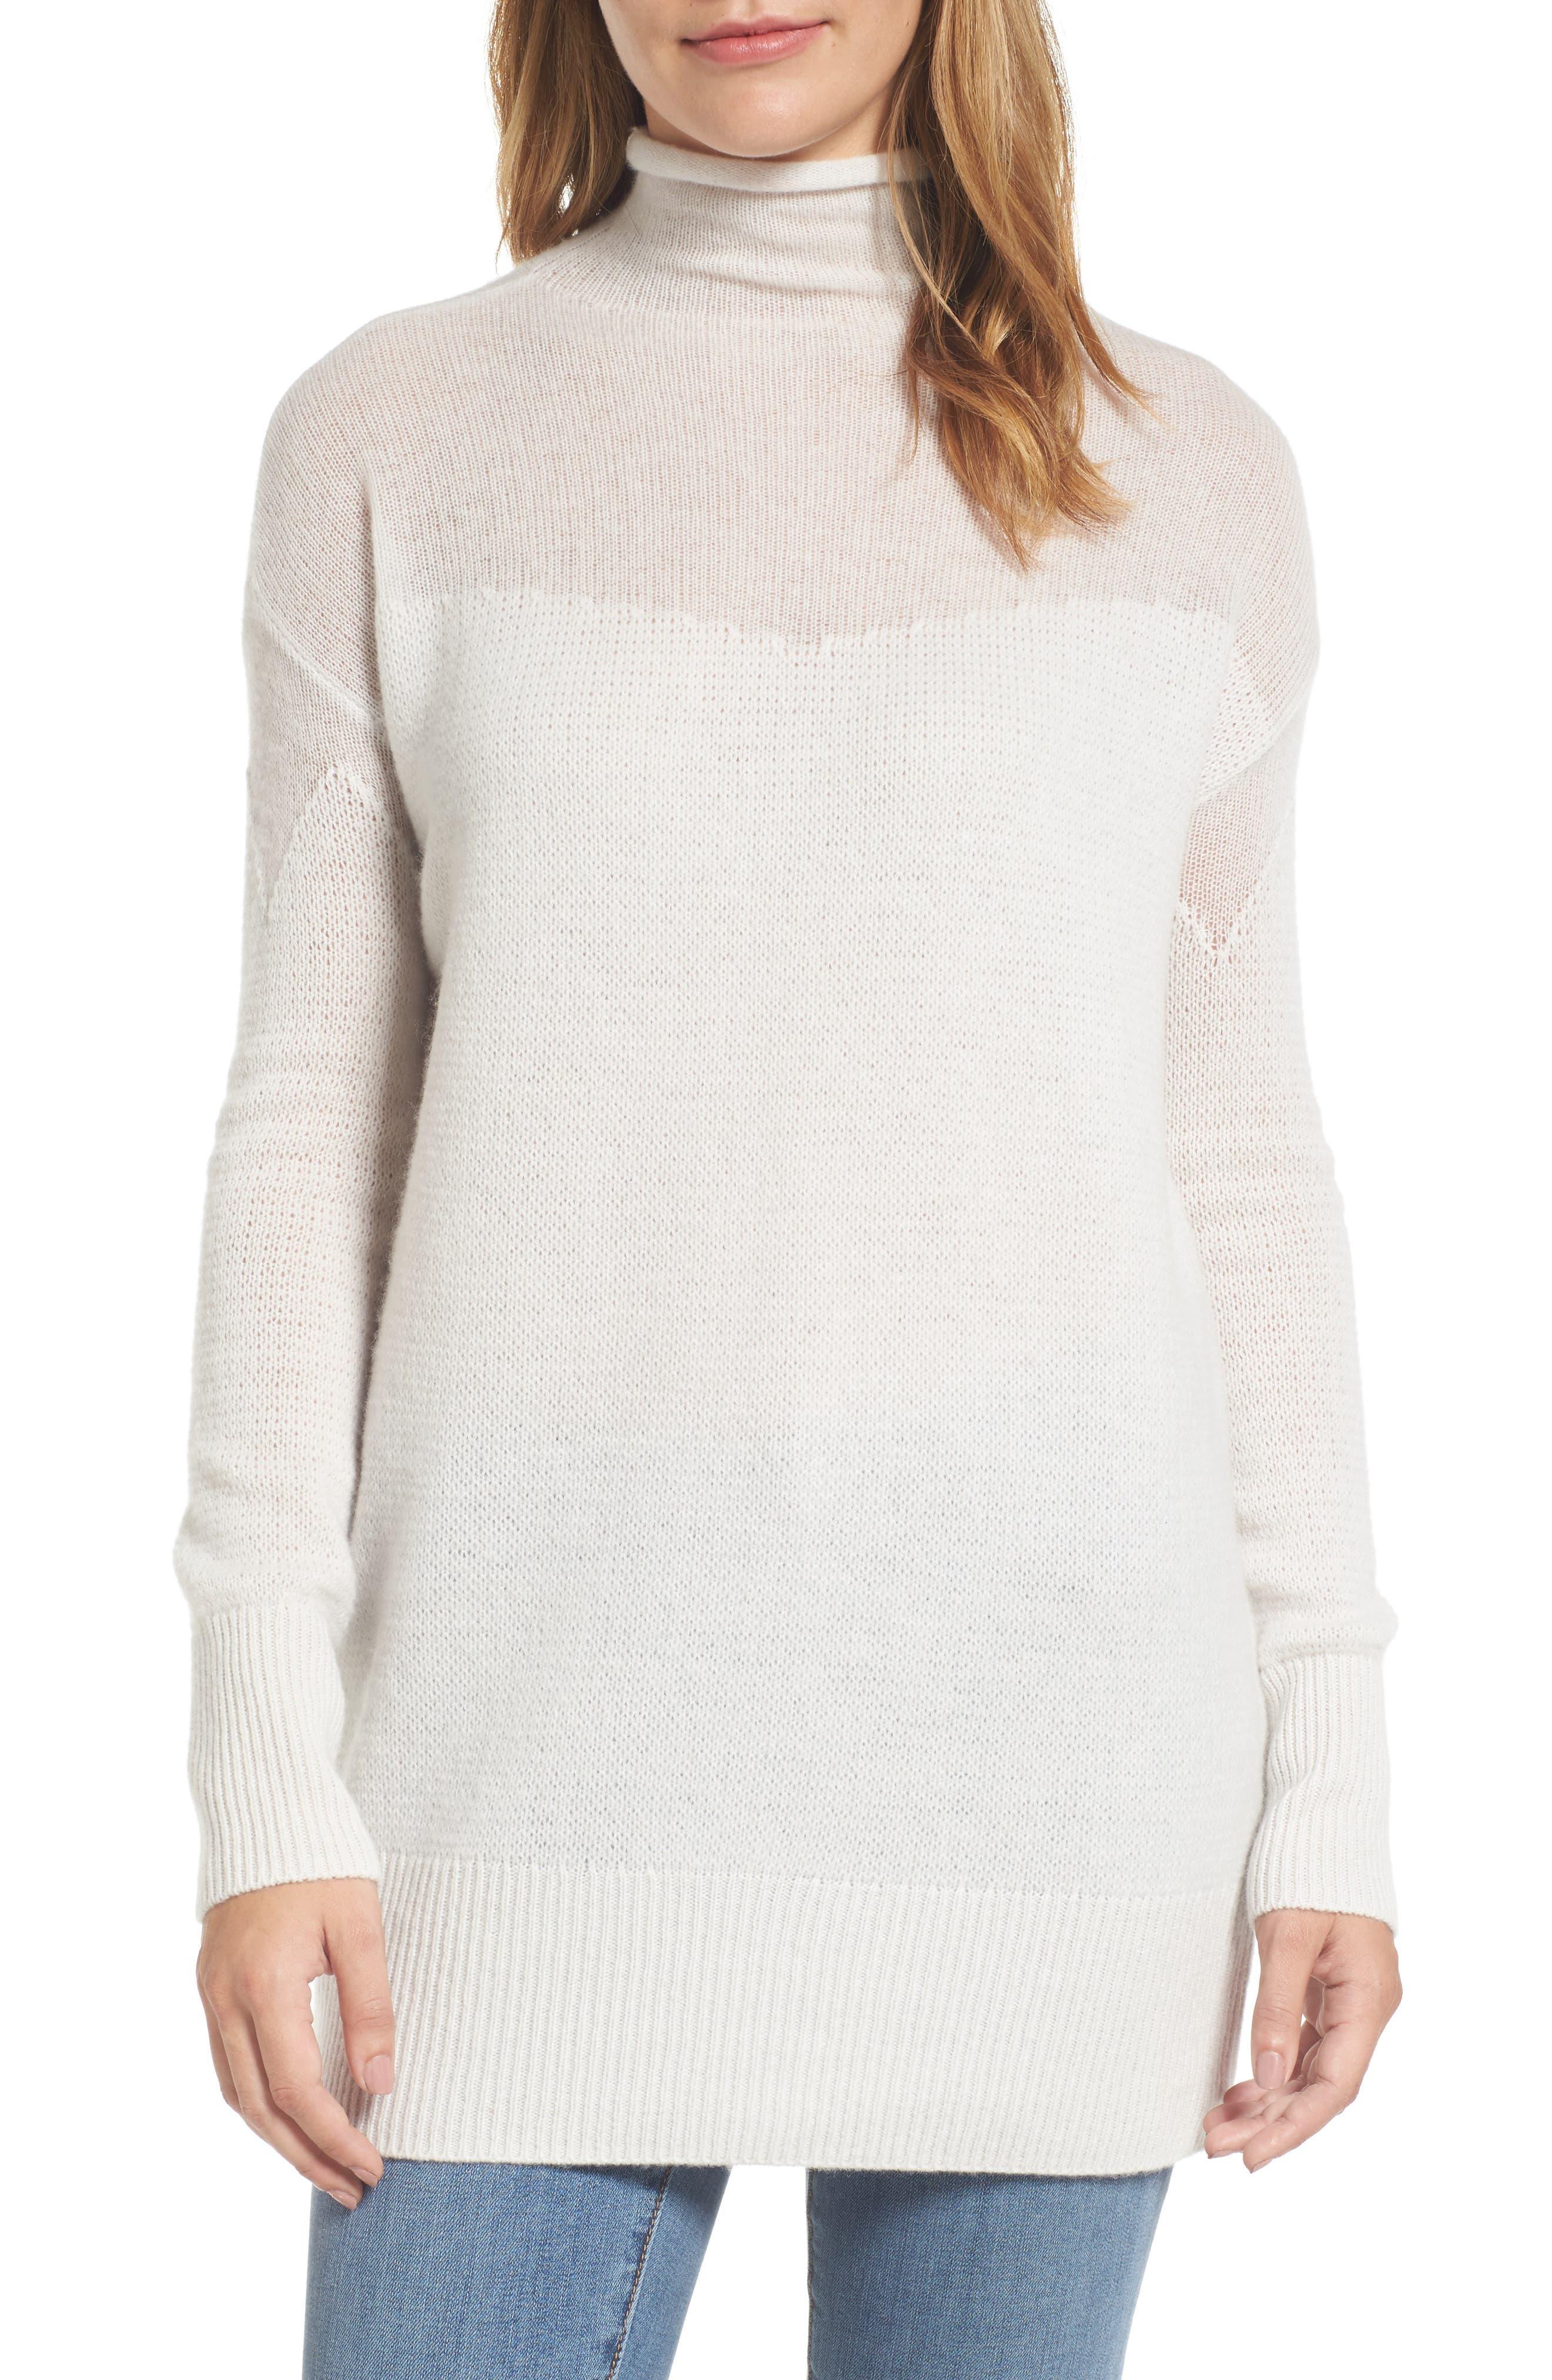 Main Image - Halogen® Sheer Yoke Cashmere Sweater (Regular & Petite)